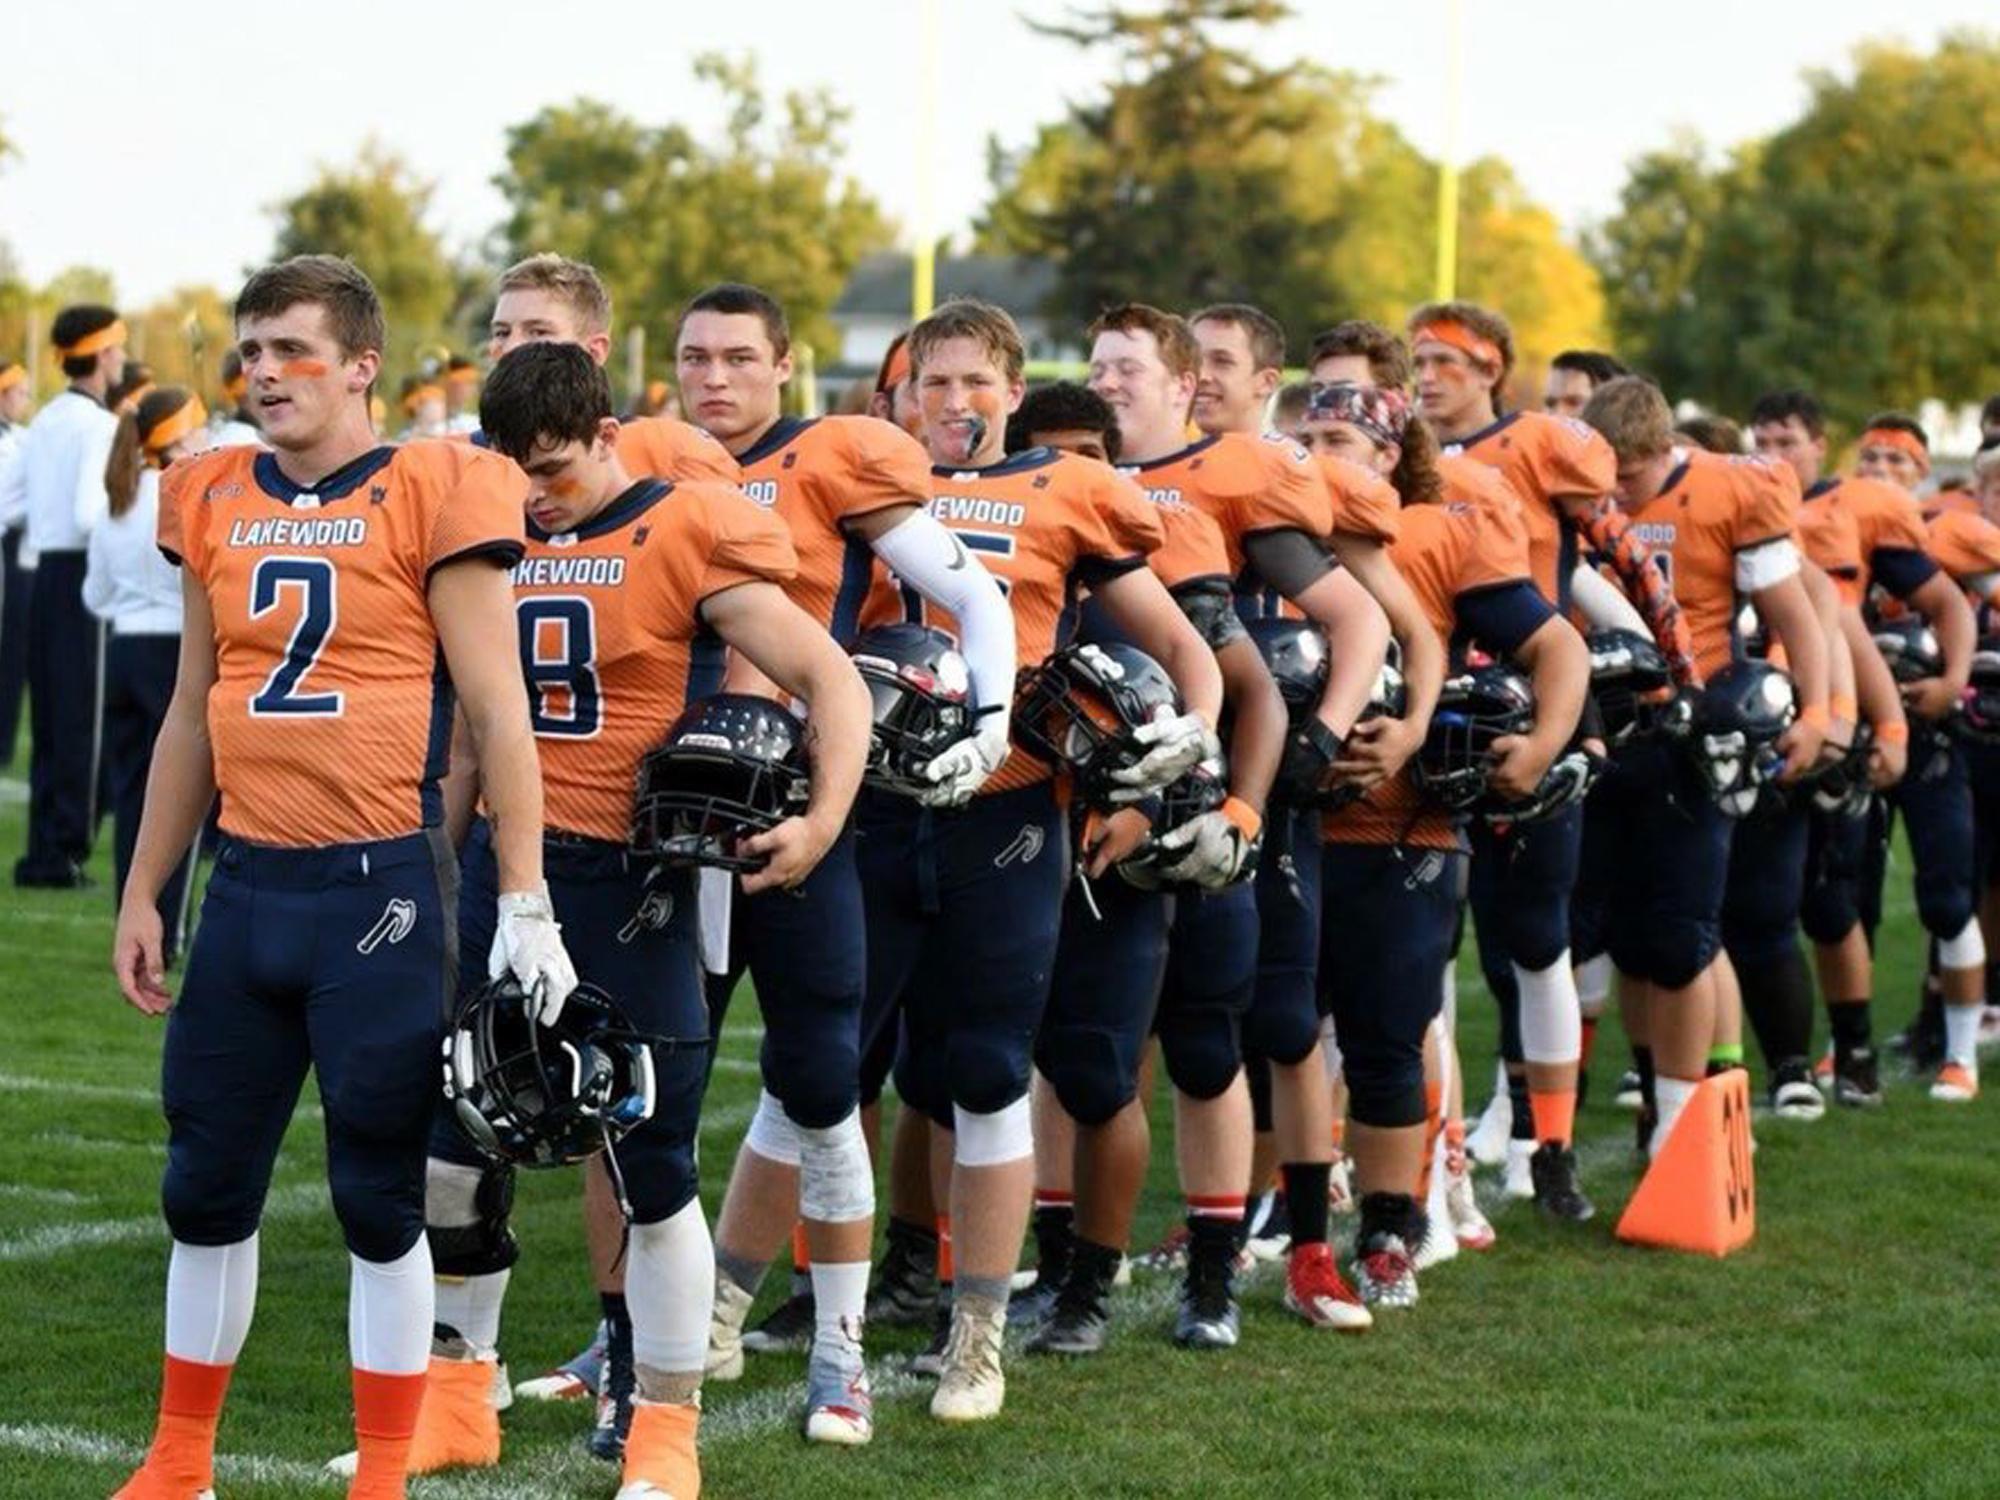 Lakewood High School Football Cause Game Jerseys